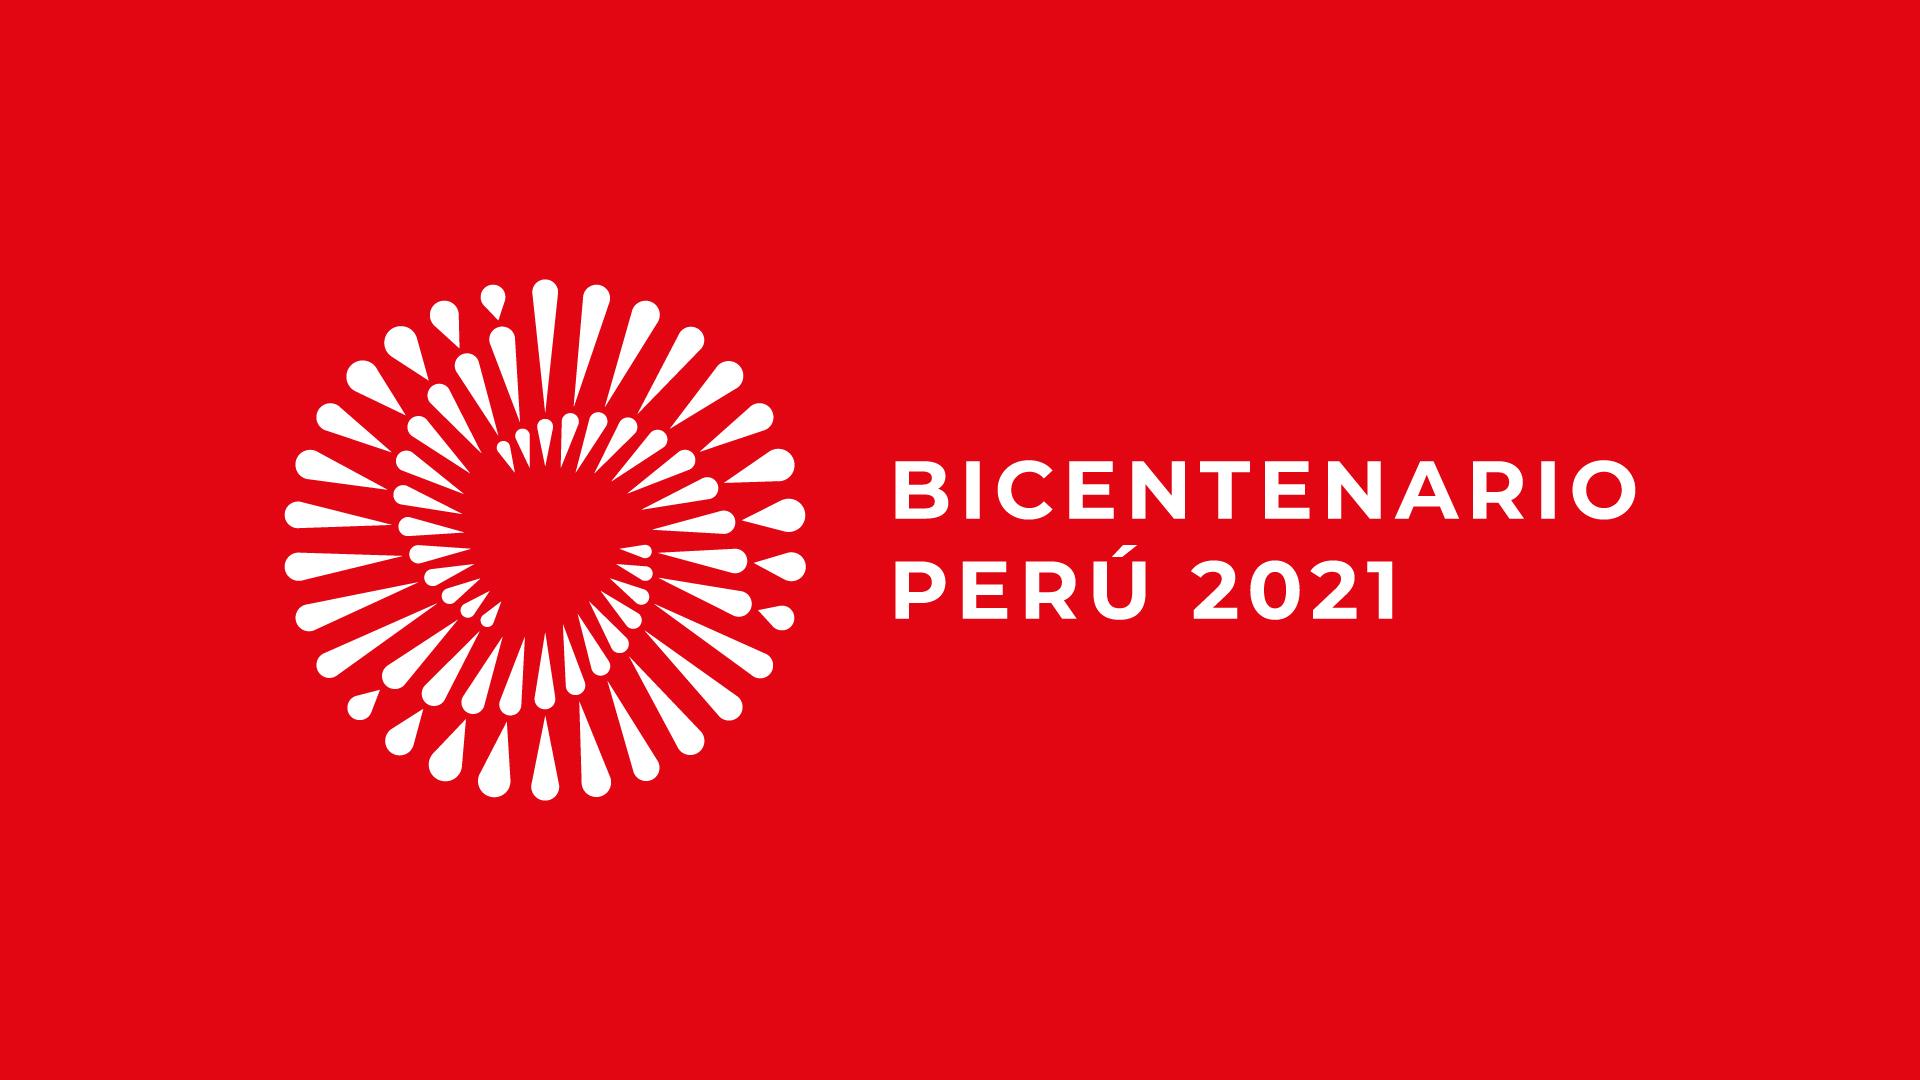 logo-fondo-rojo-horizontal.jpg